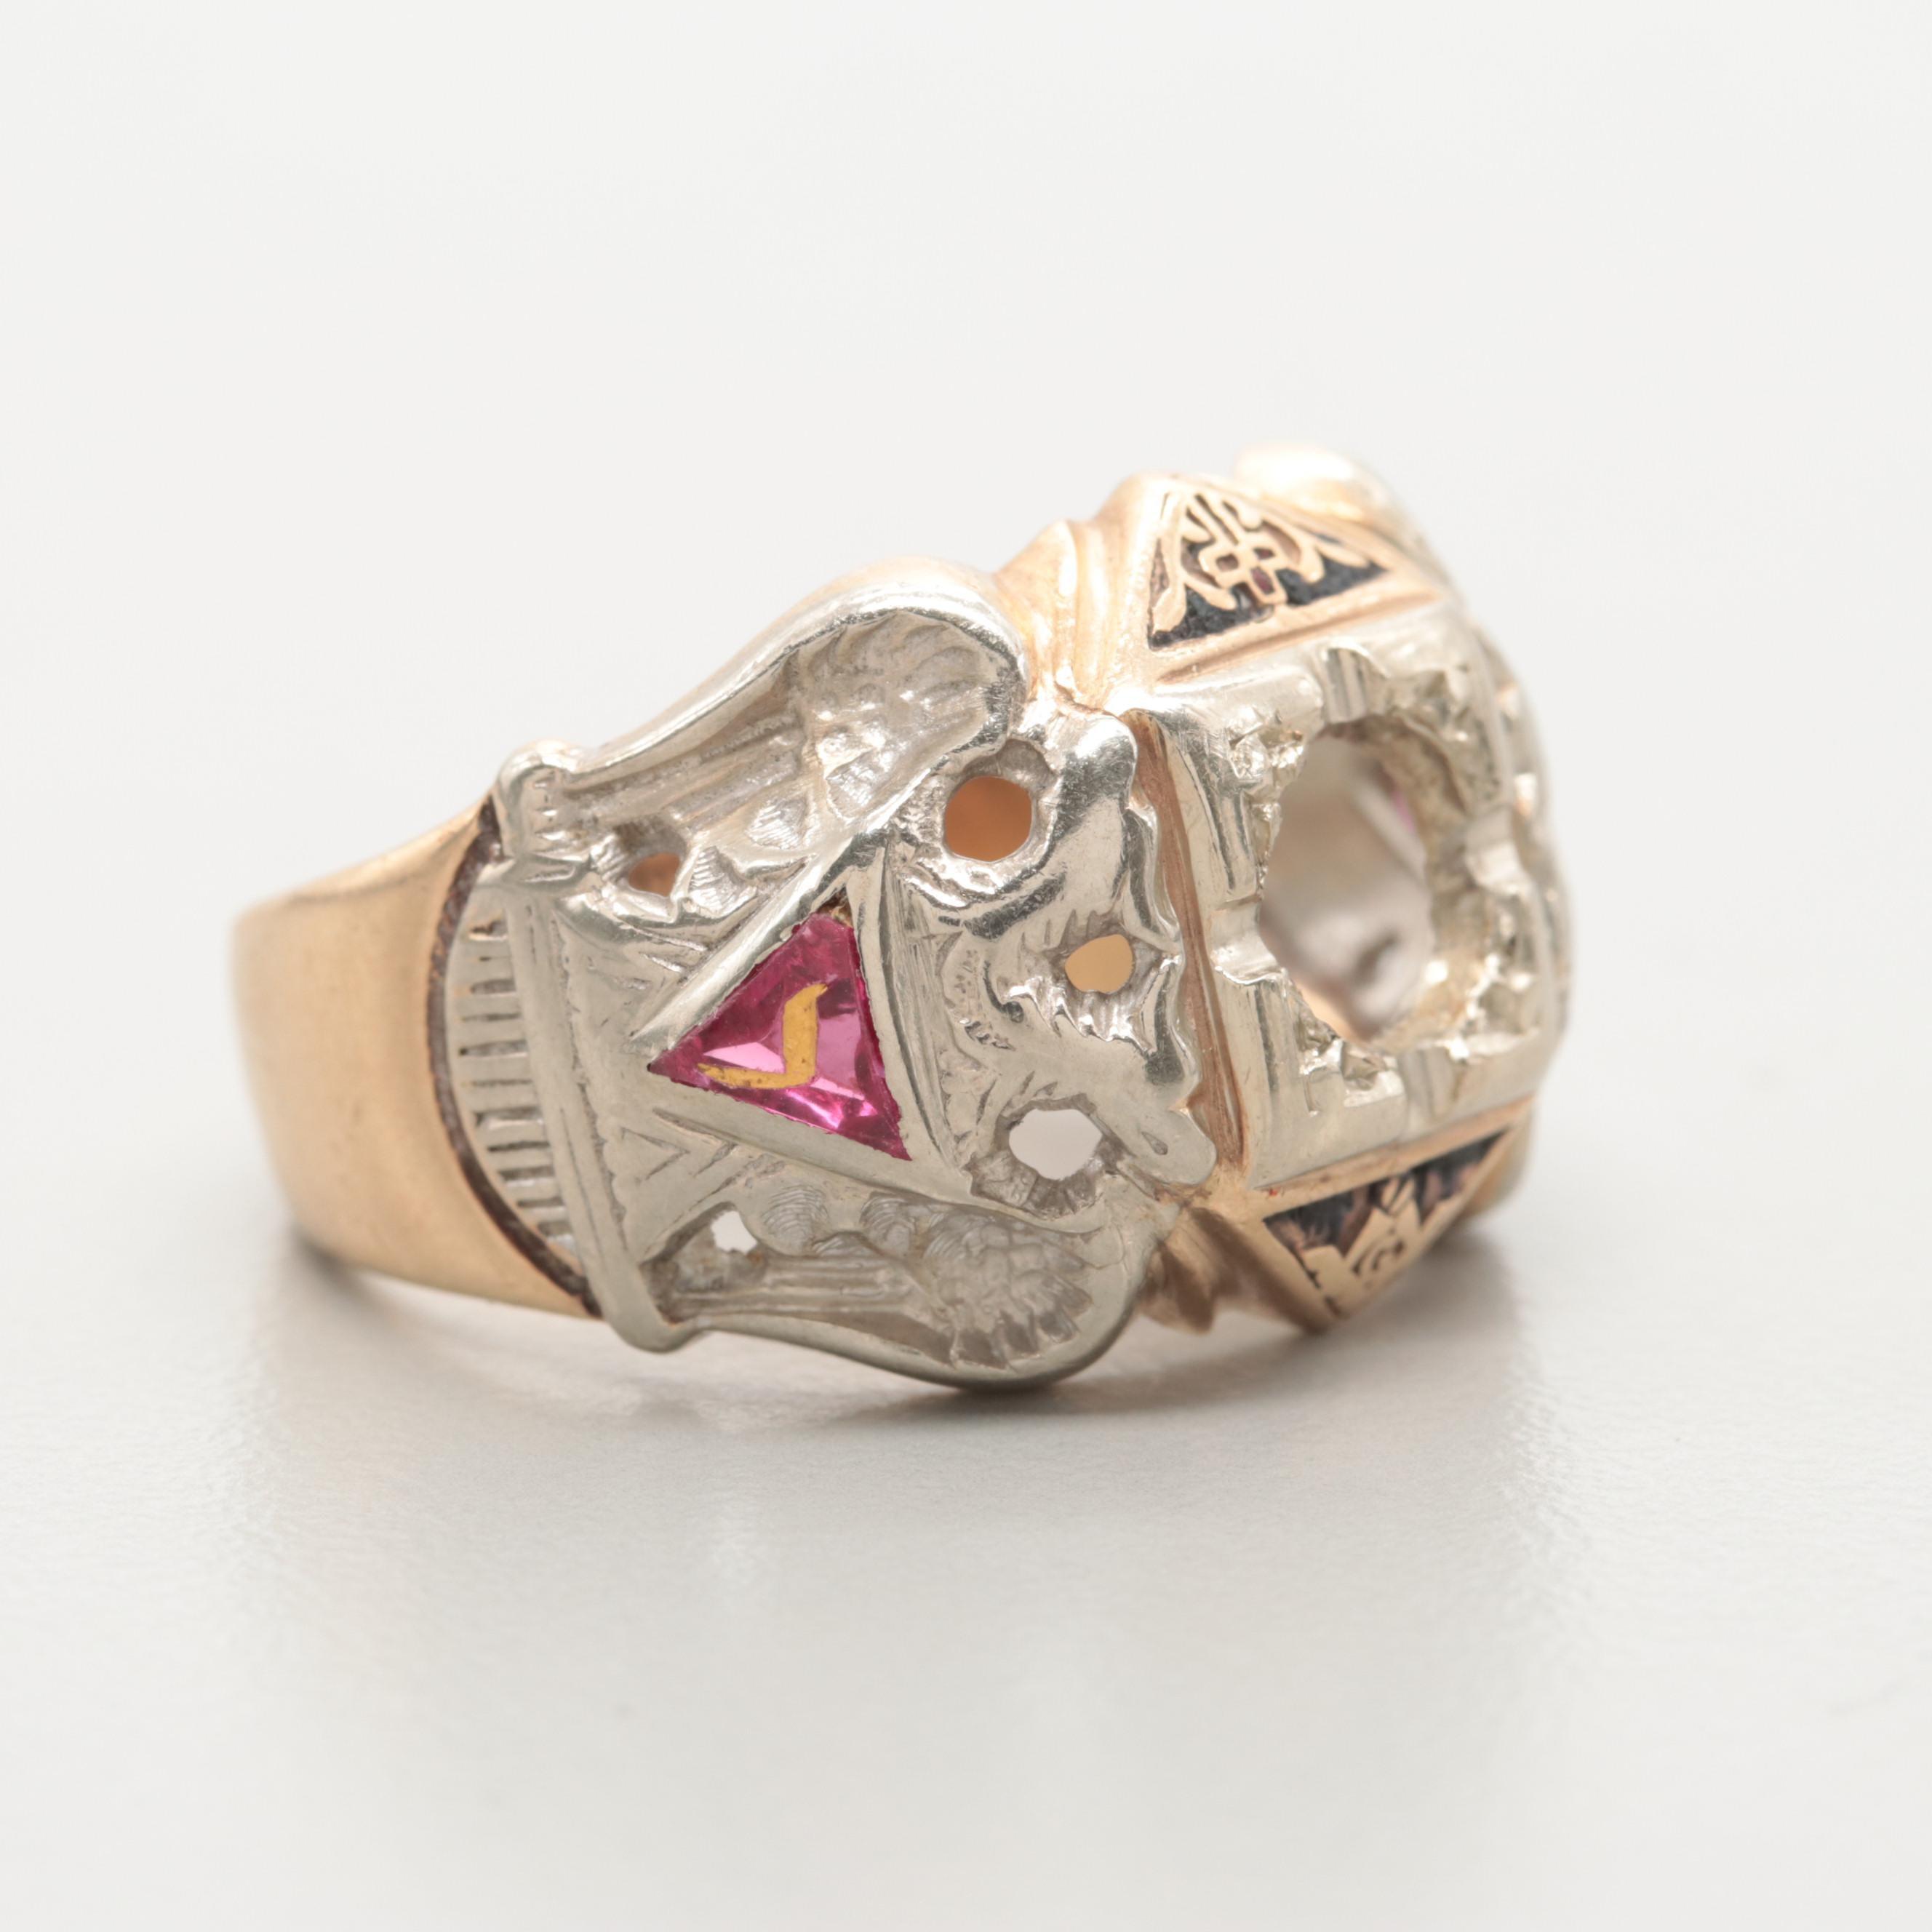 10K Yellow Gold Masonic Synthetic Ruby Semi-Mount Ring